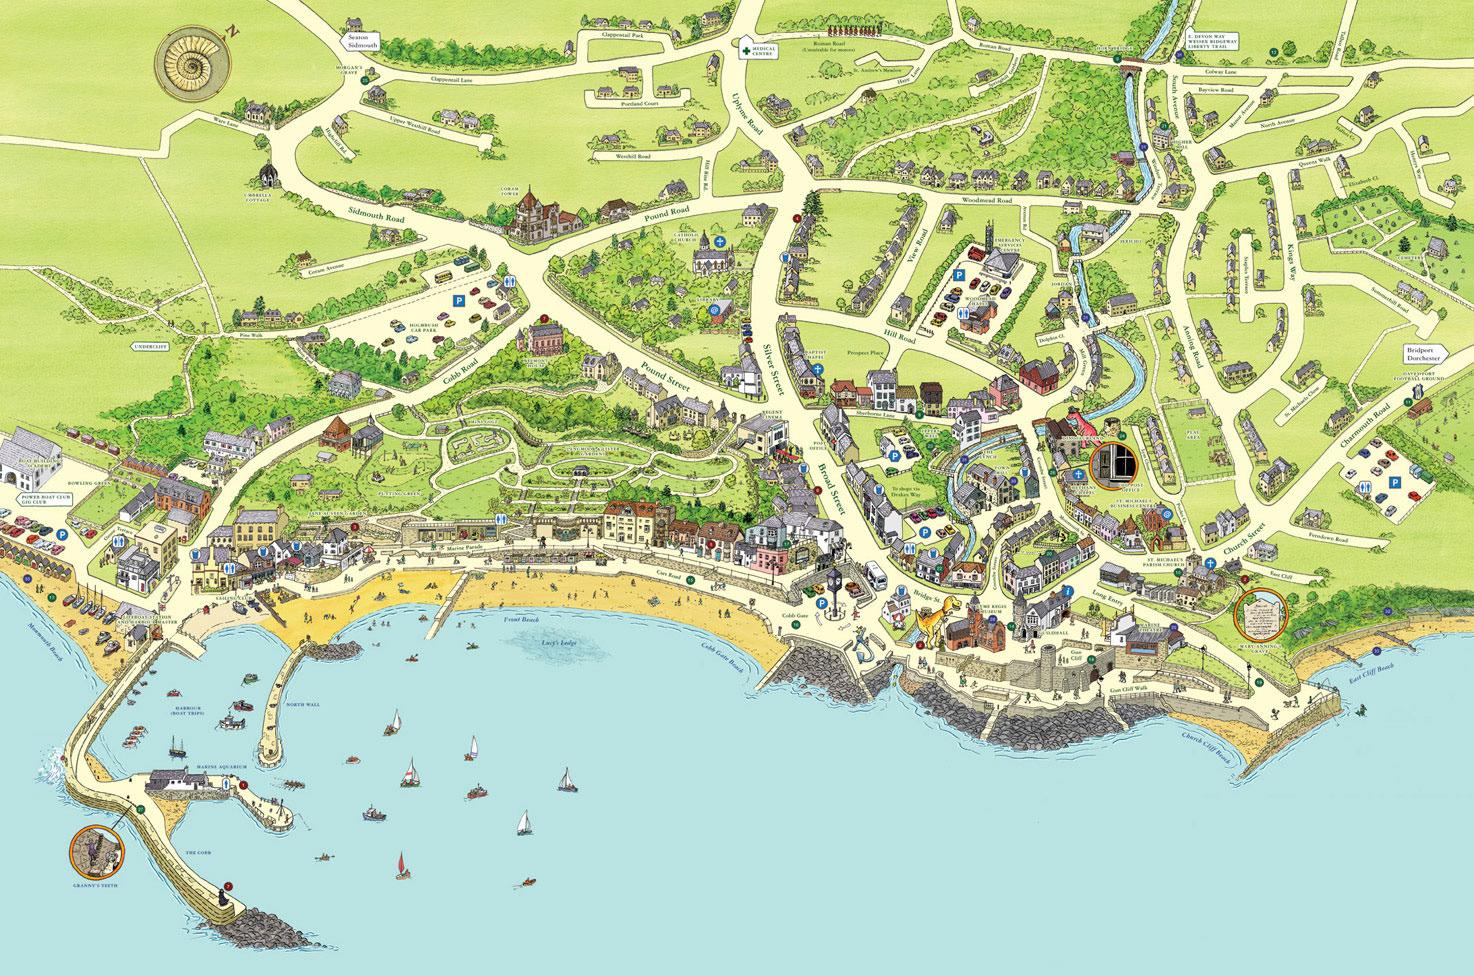 Map Of Lyme Regis Keith Robinson Illustration   Lyme Regis, Tourist Map Map Of Lyme Regis